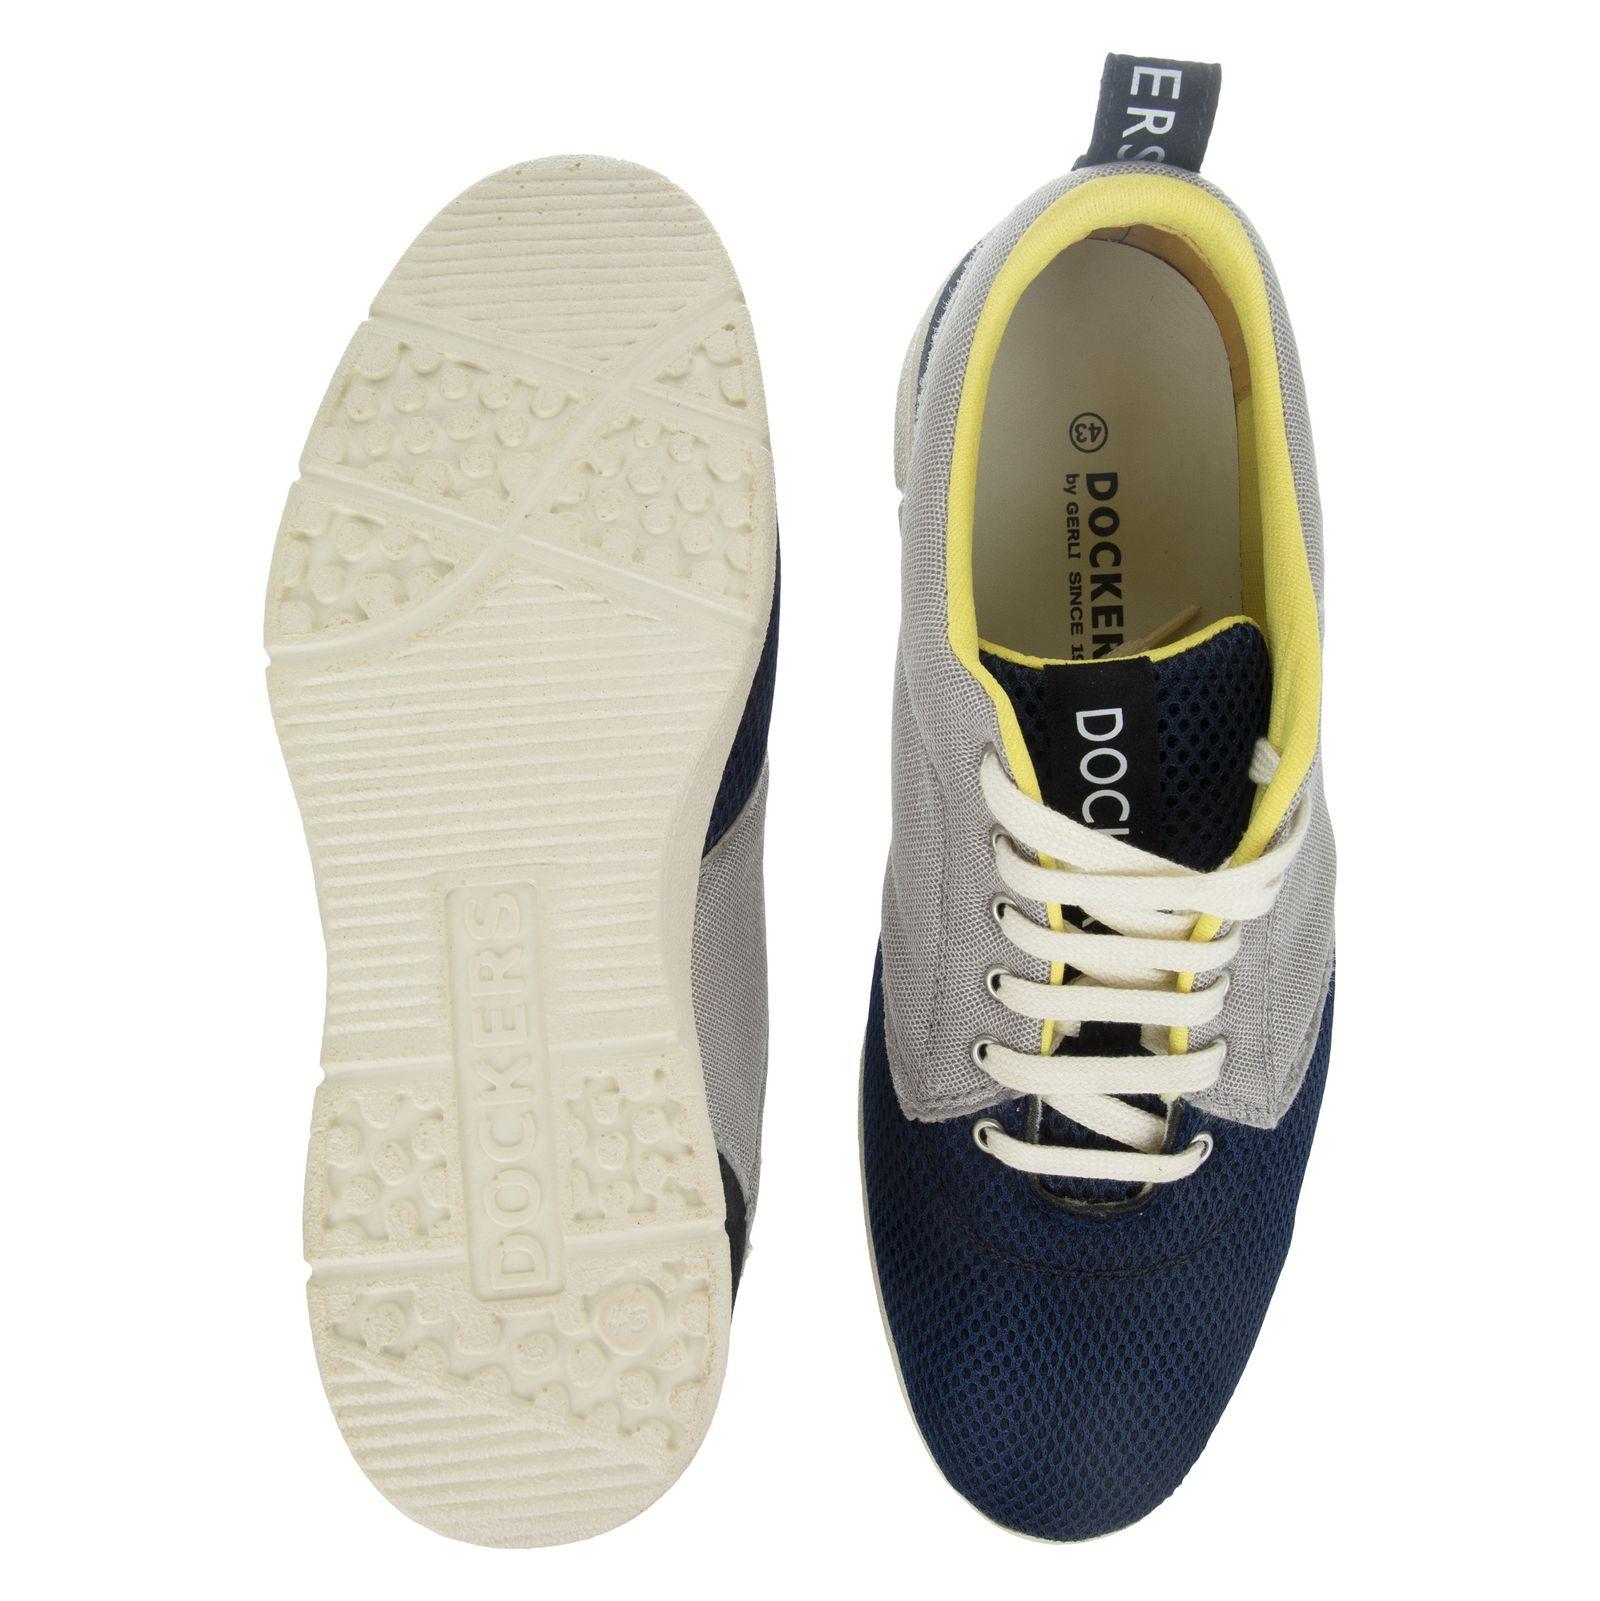 کفش روزمره مردانه داکرز مدل 100209331-101 - مشکی - 2